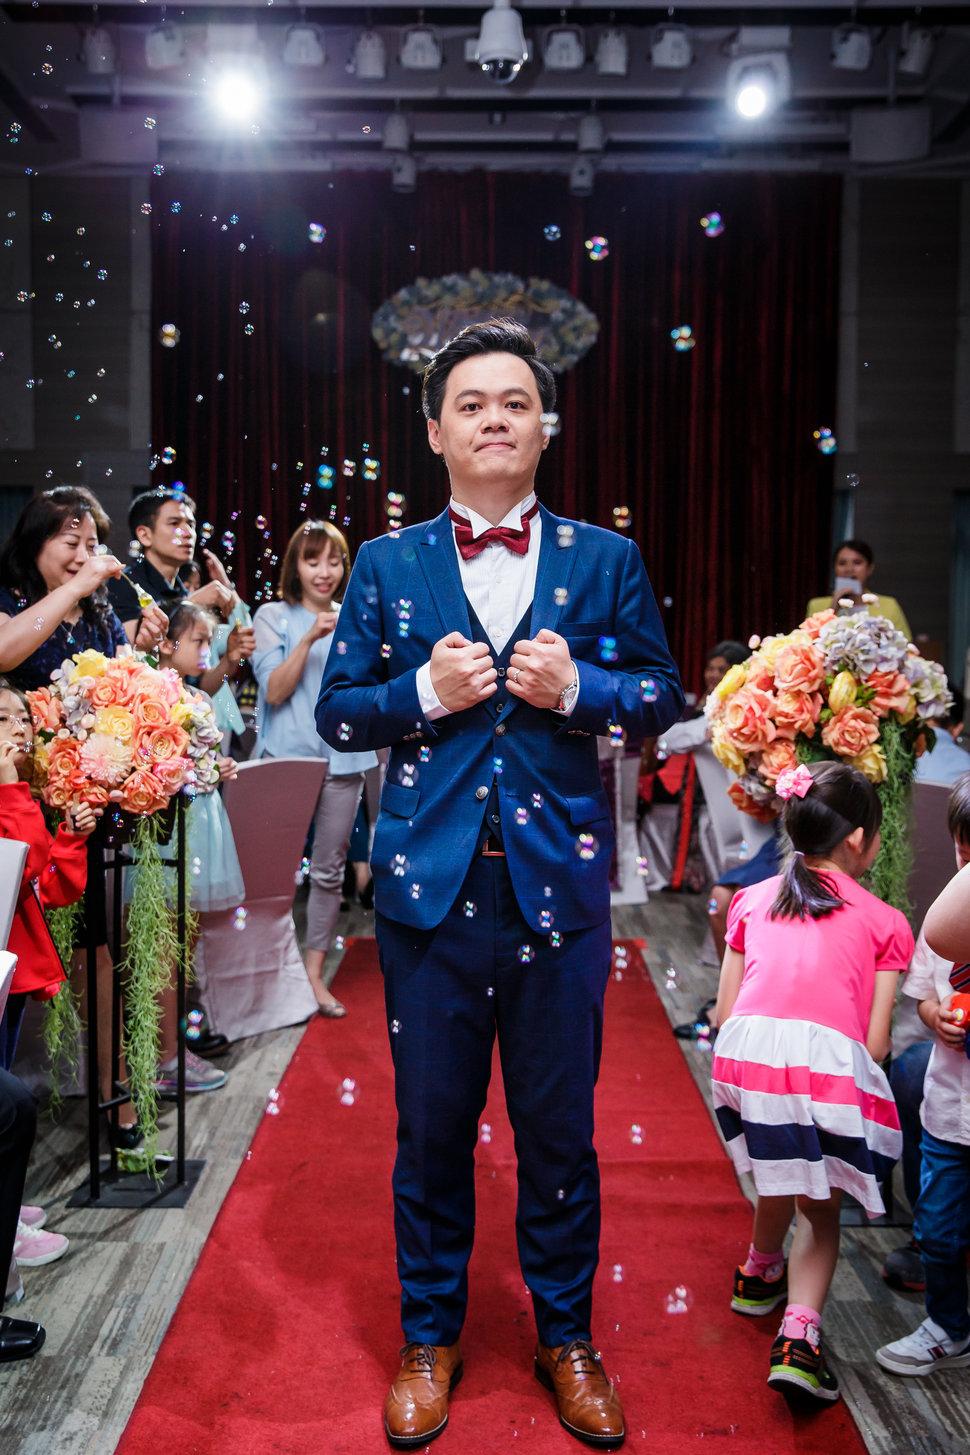 wedding-456 - J-Love 婚禮攝影團隊《結婚吧》